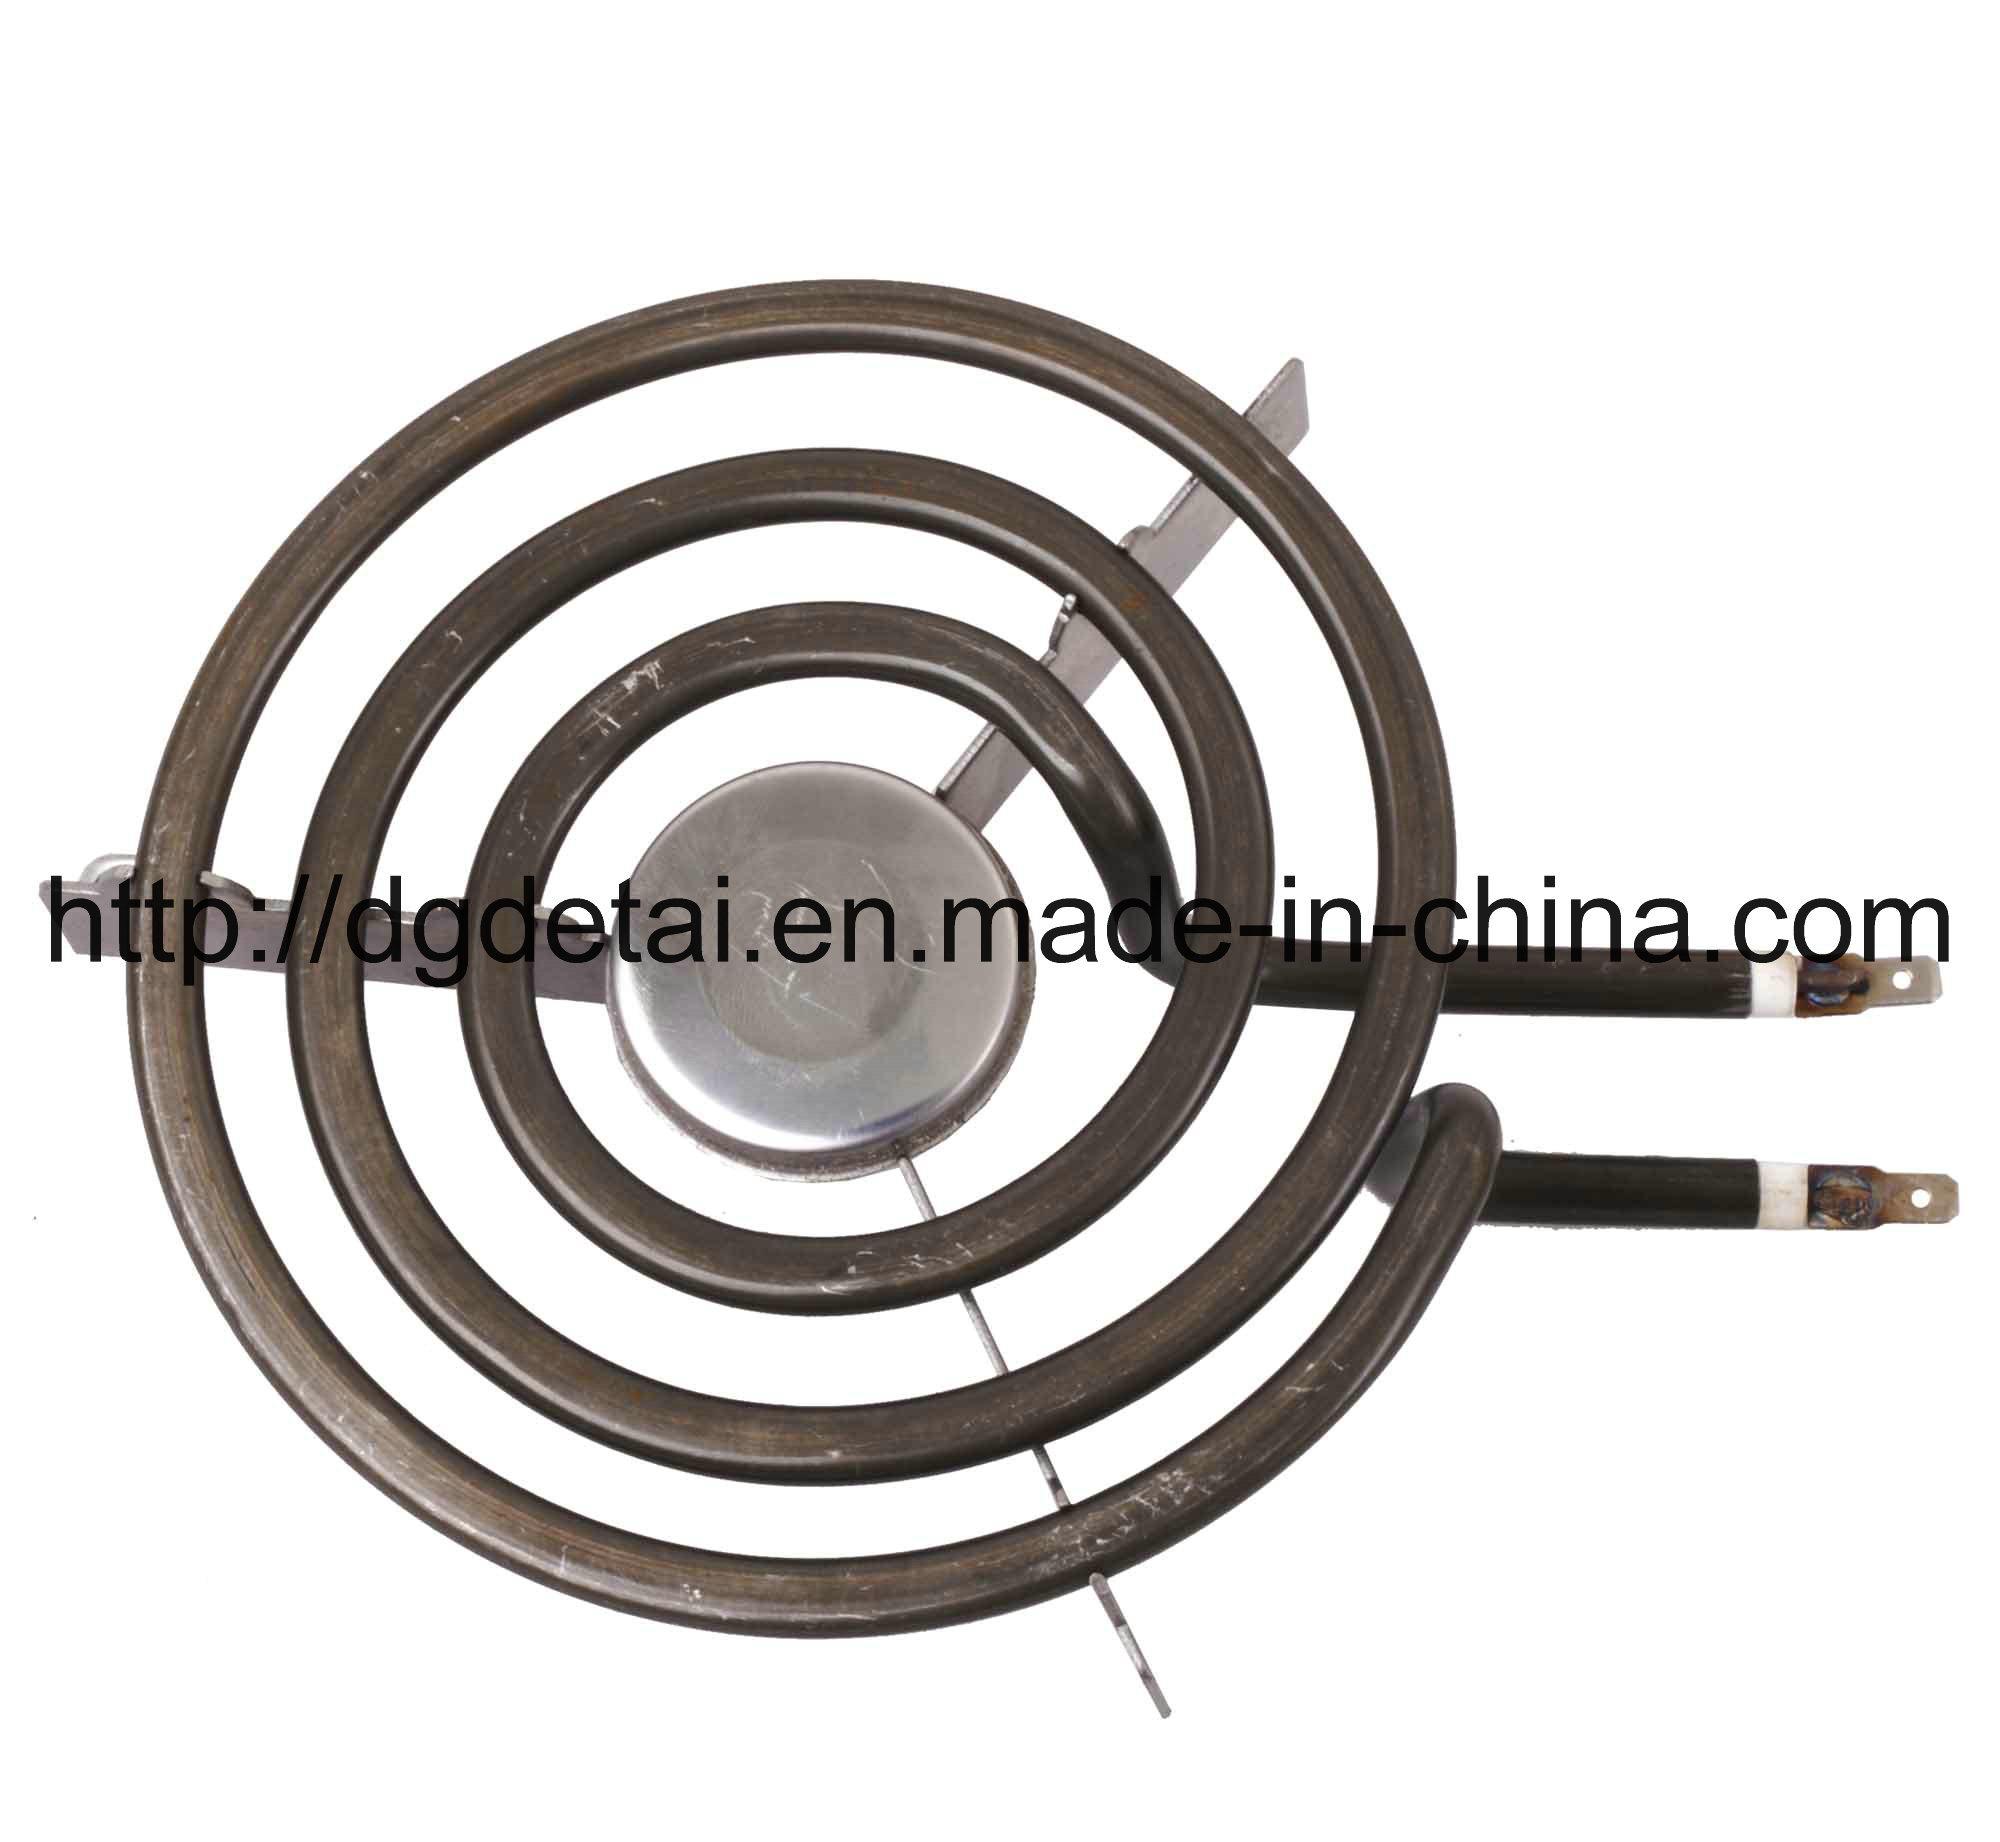 Electric Stove Parts ~ Stoves electric stove parts